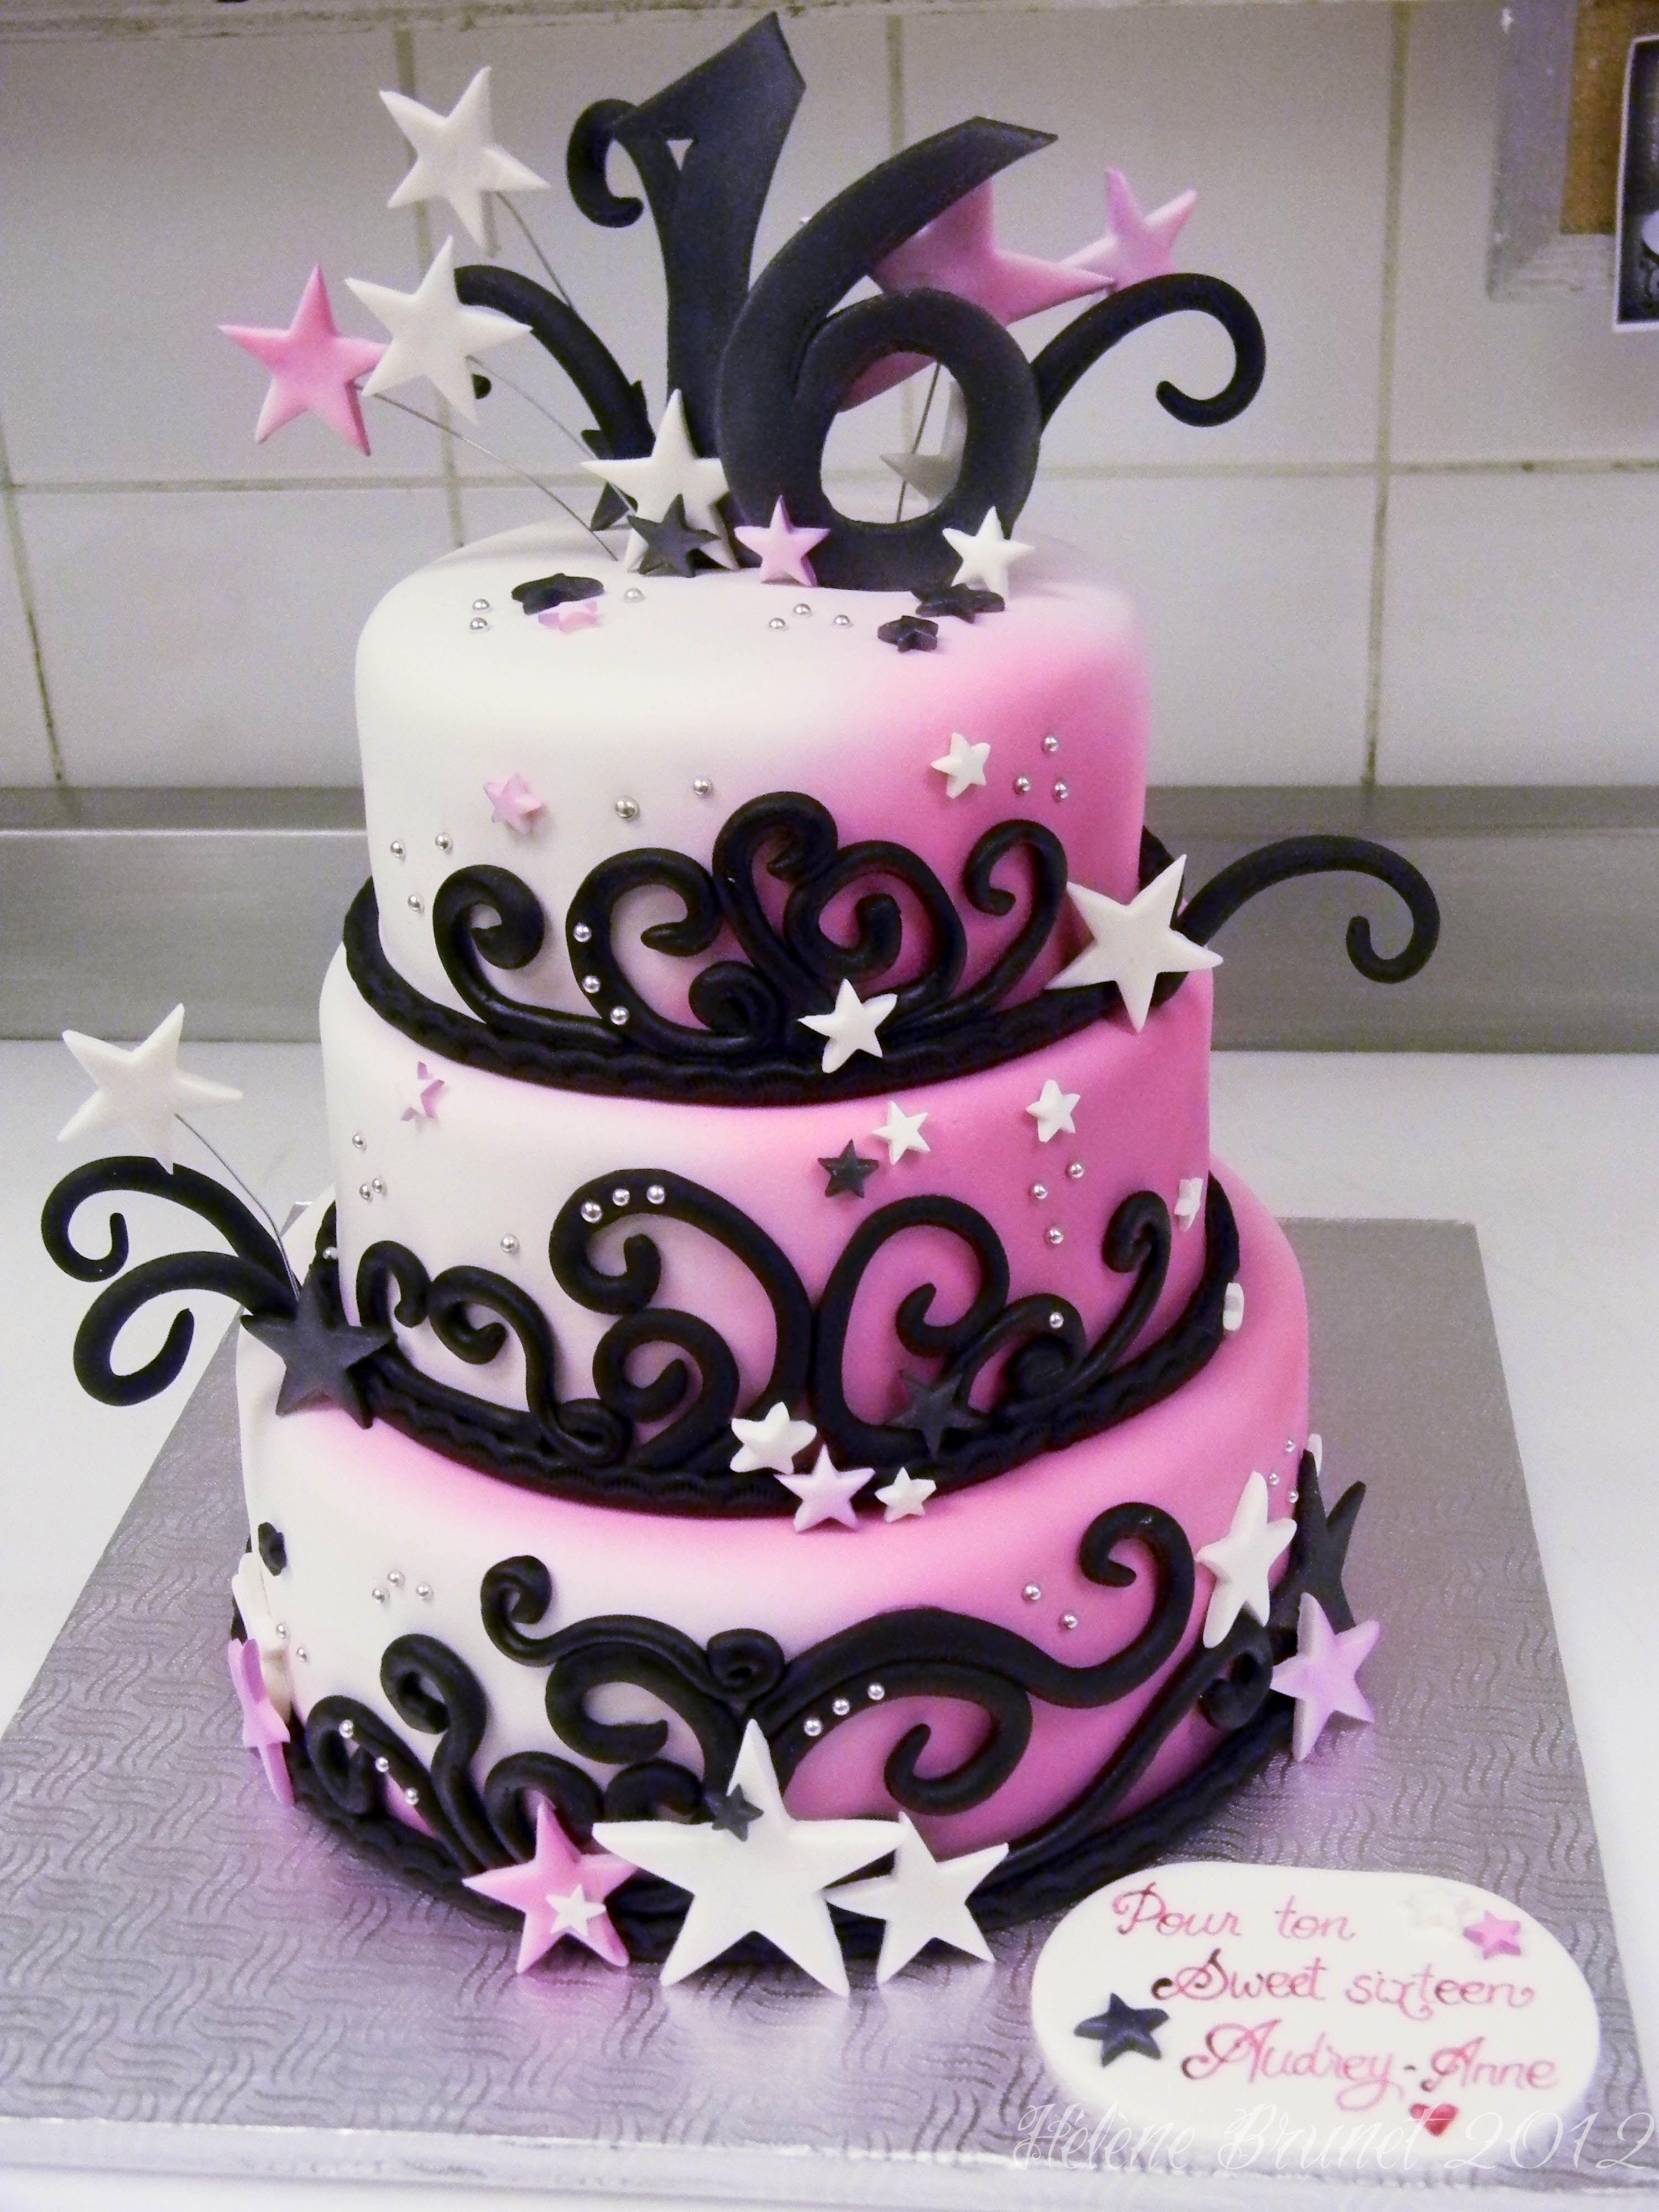 Sweet Sixteen Birthday Cake With Images Sweet 16 Birthday Cake